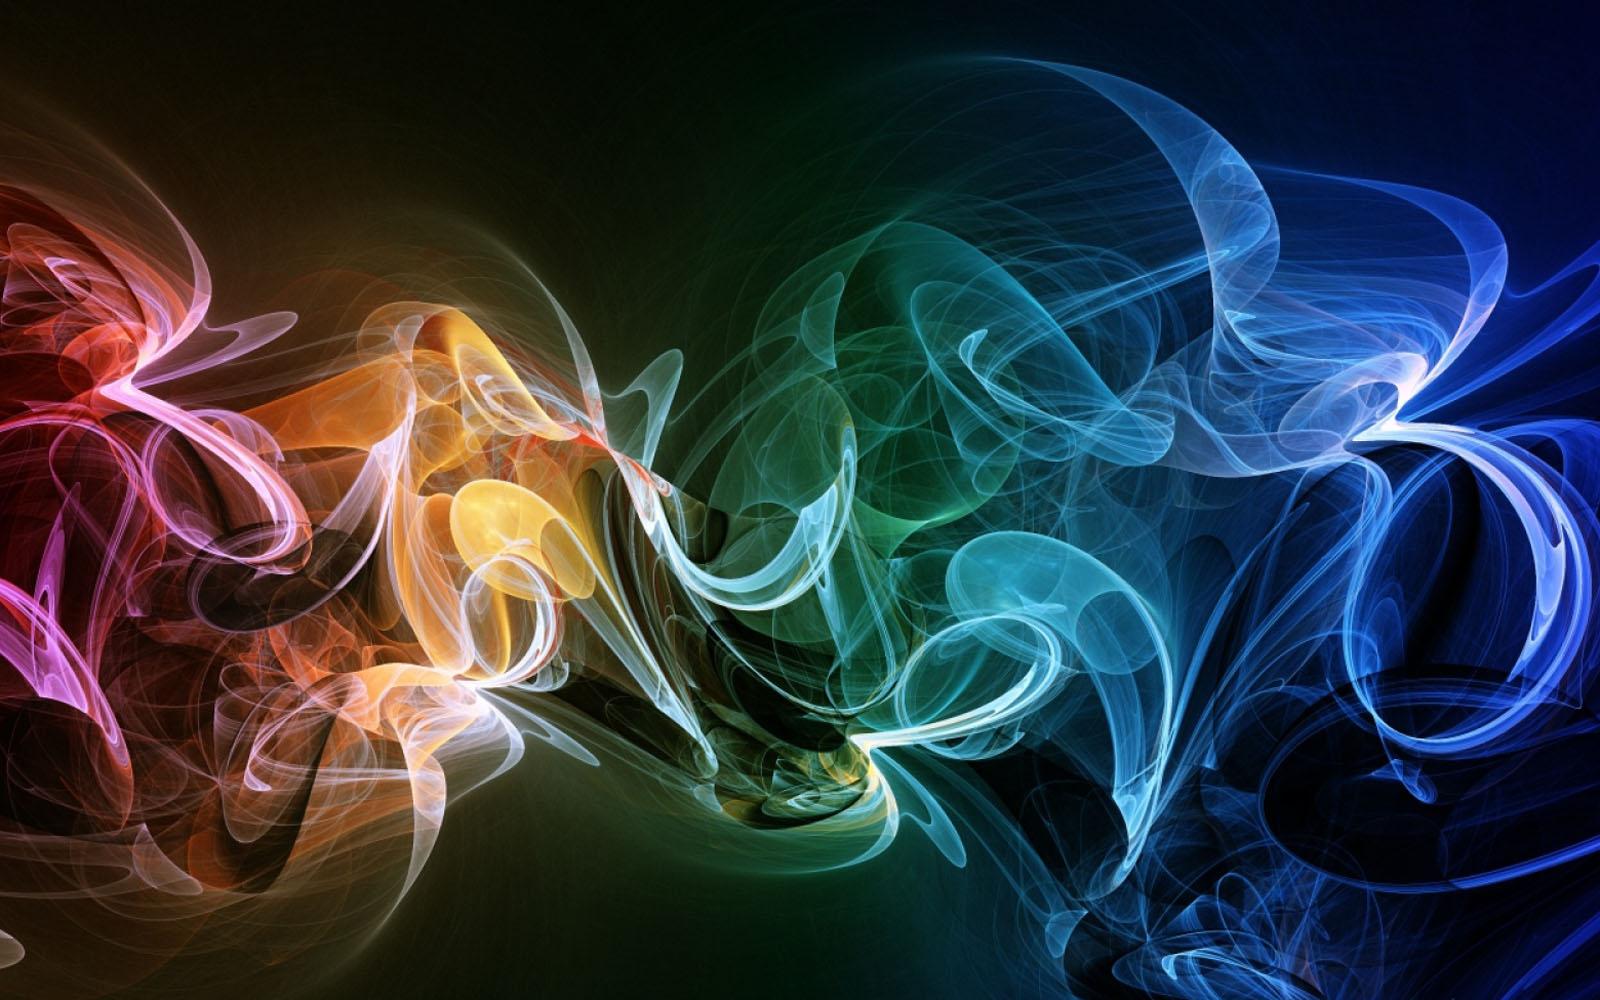 Wallpaper Abstract Smoke Wallpapers